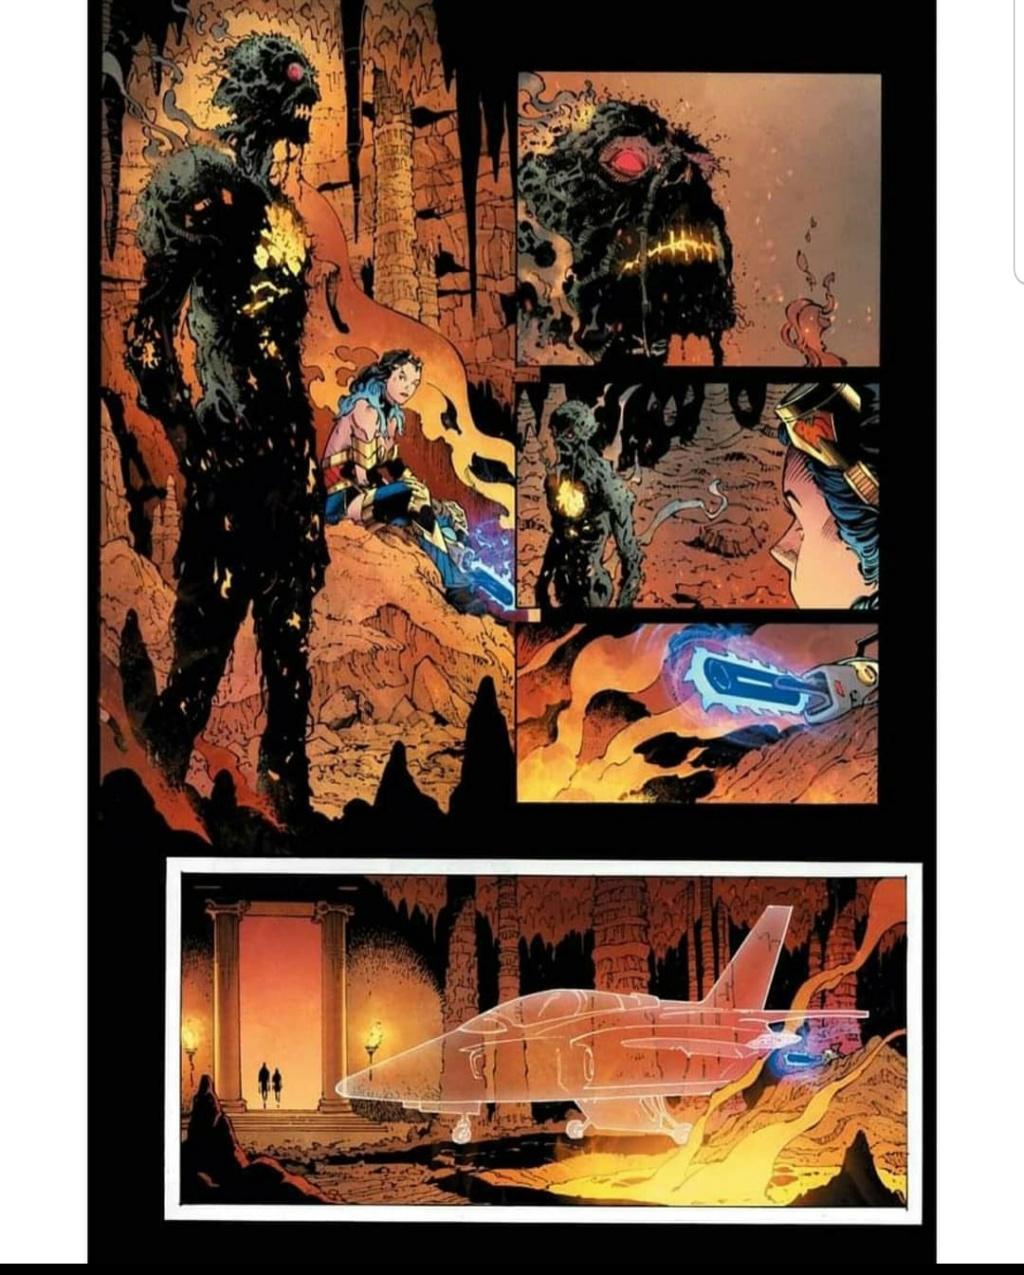 [DC COMICS] Publicaciones Universo DC: Discusión General v2 - Página 16 20200318